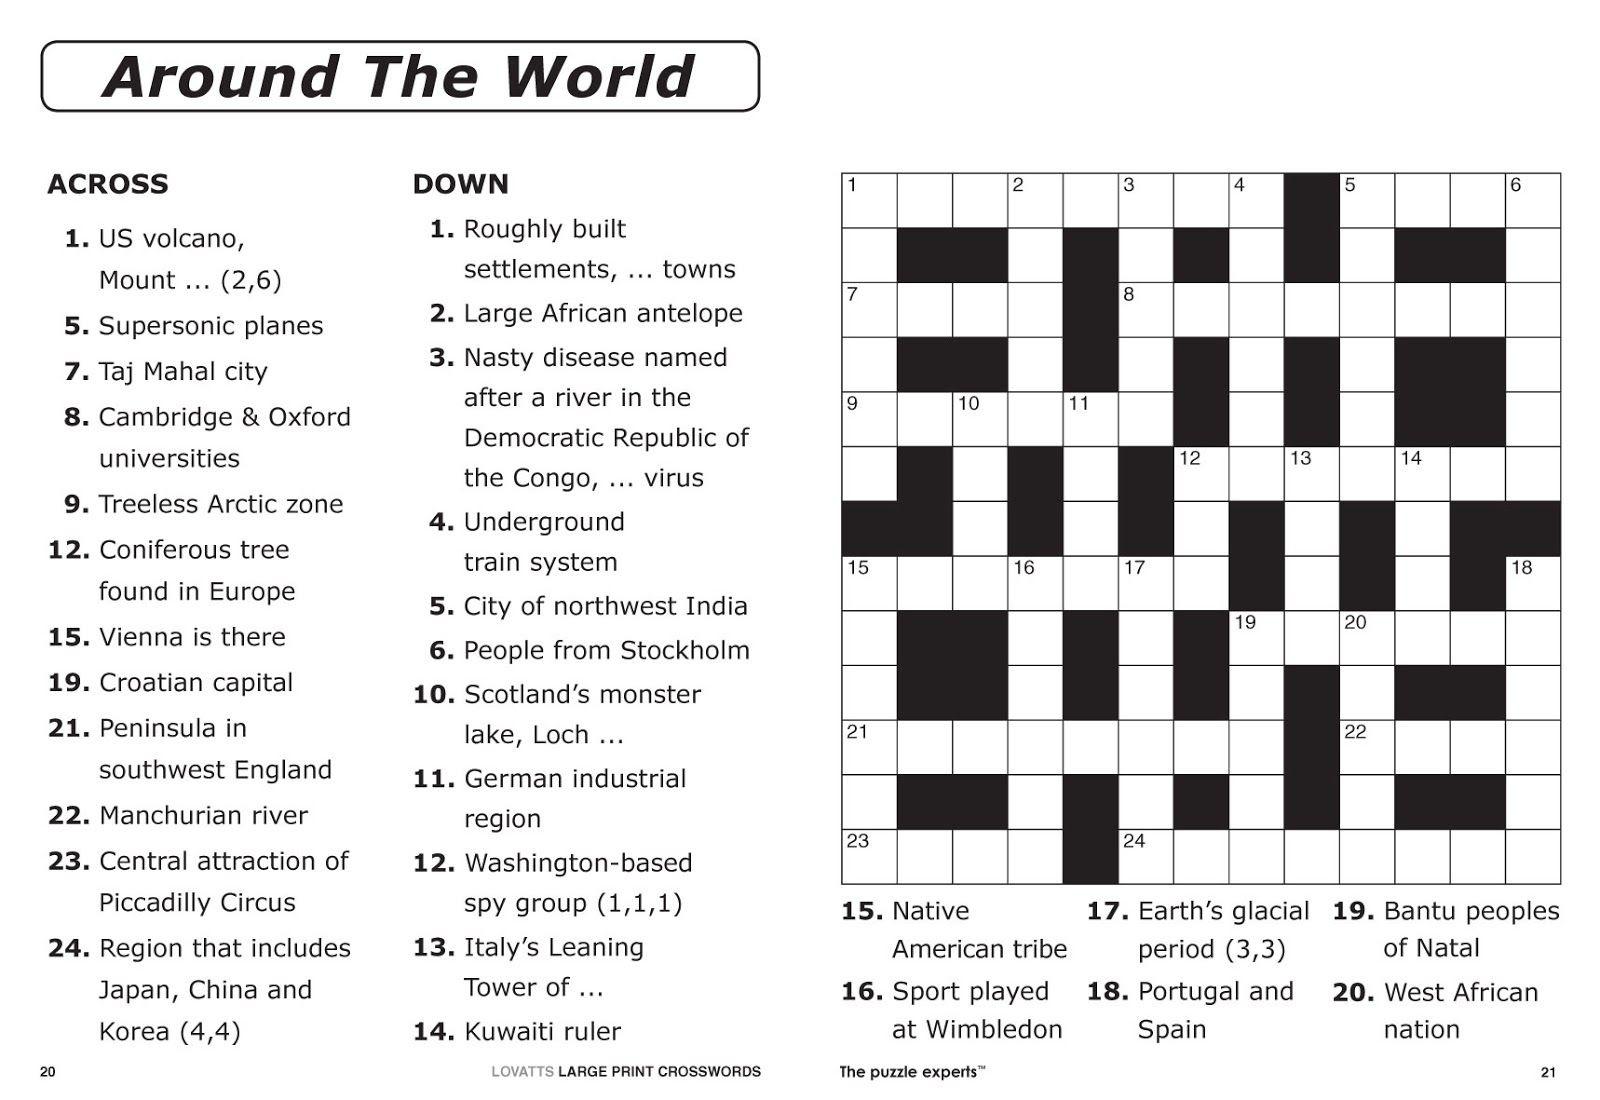 Free Printable Large Print Crossword Puzzles   M3U8 - Free Printable Crossword Puzzle Maker Download